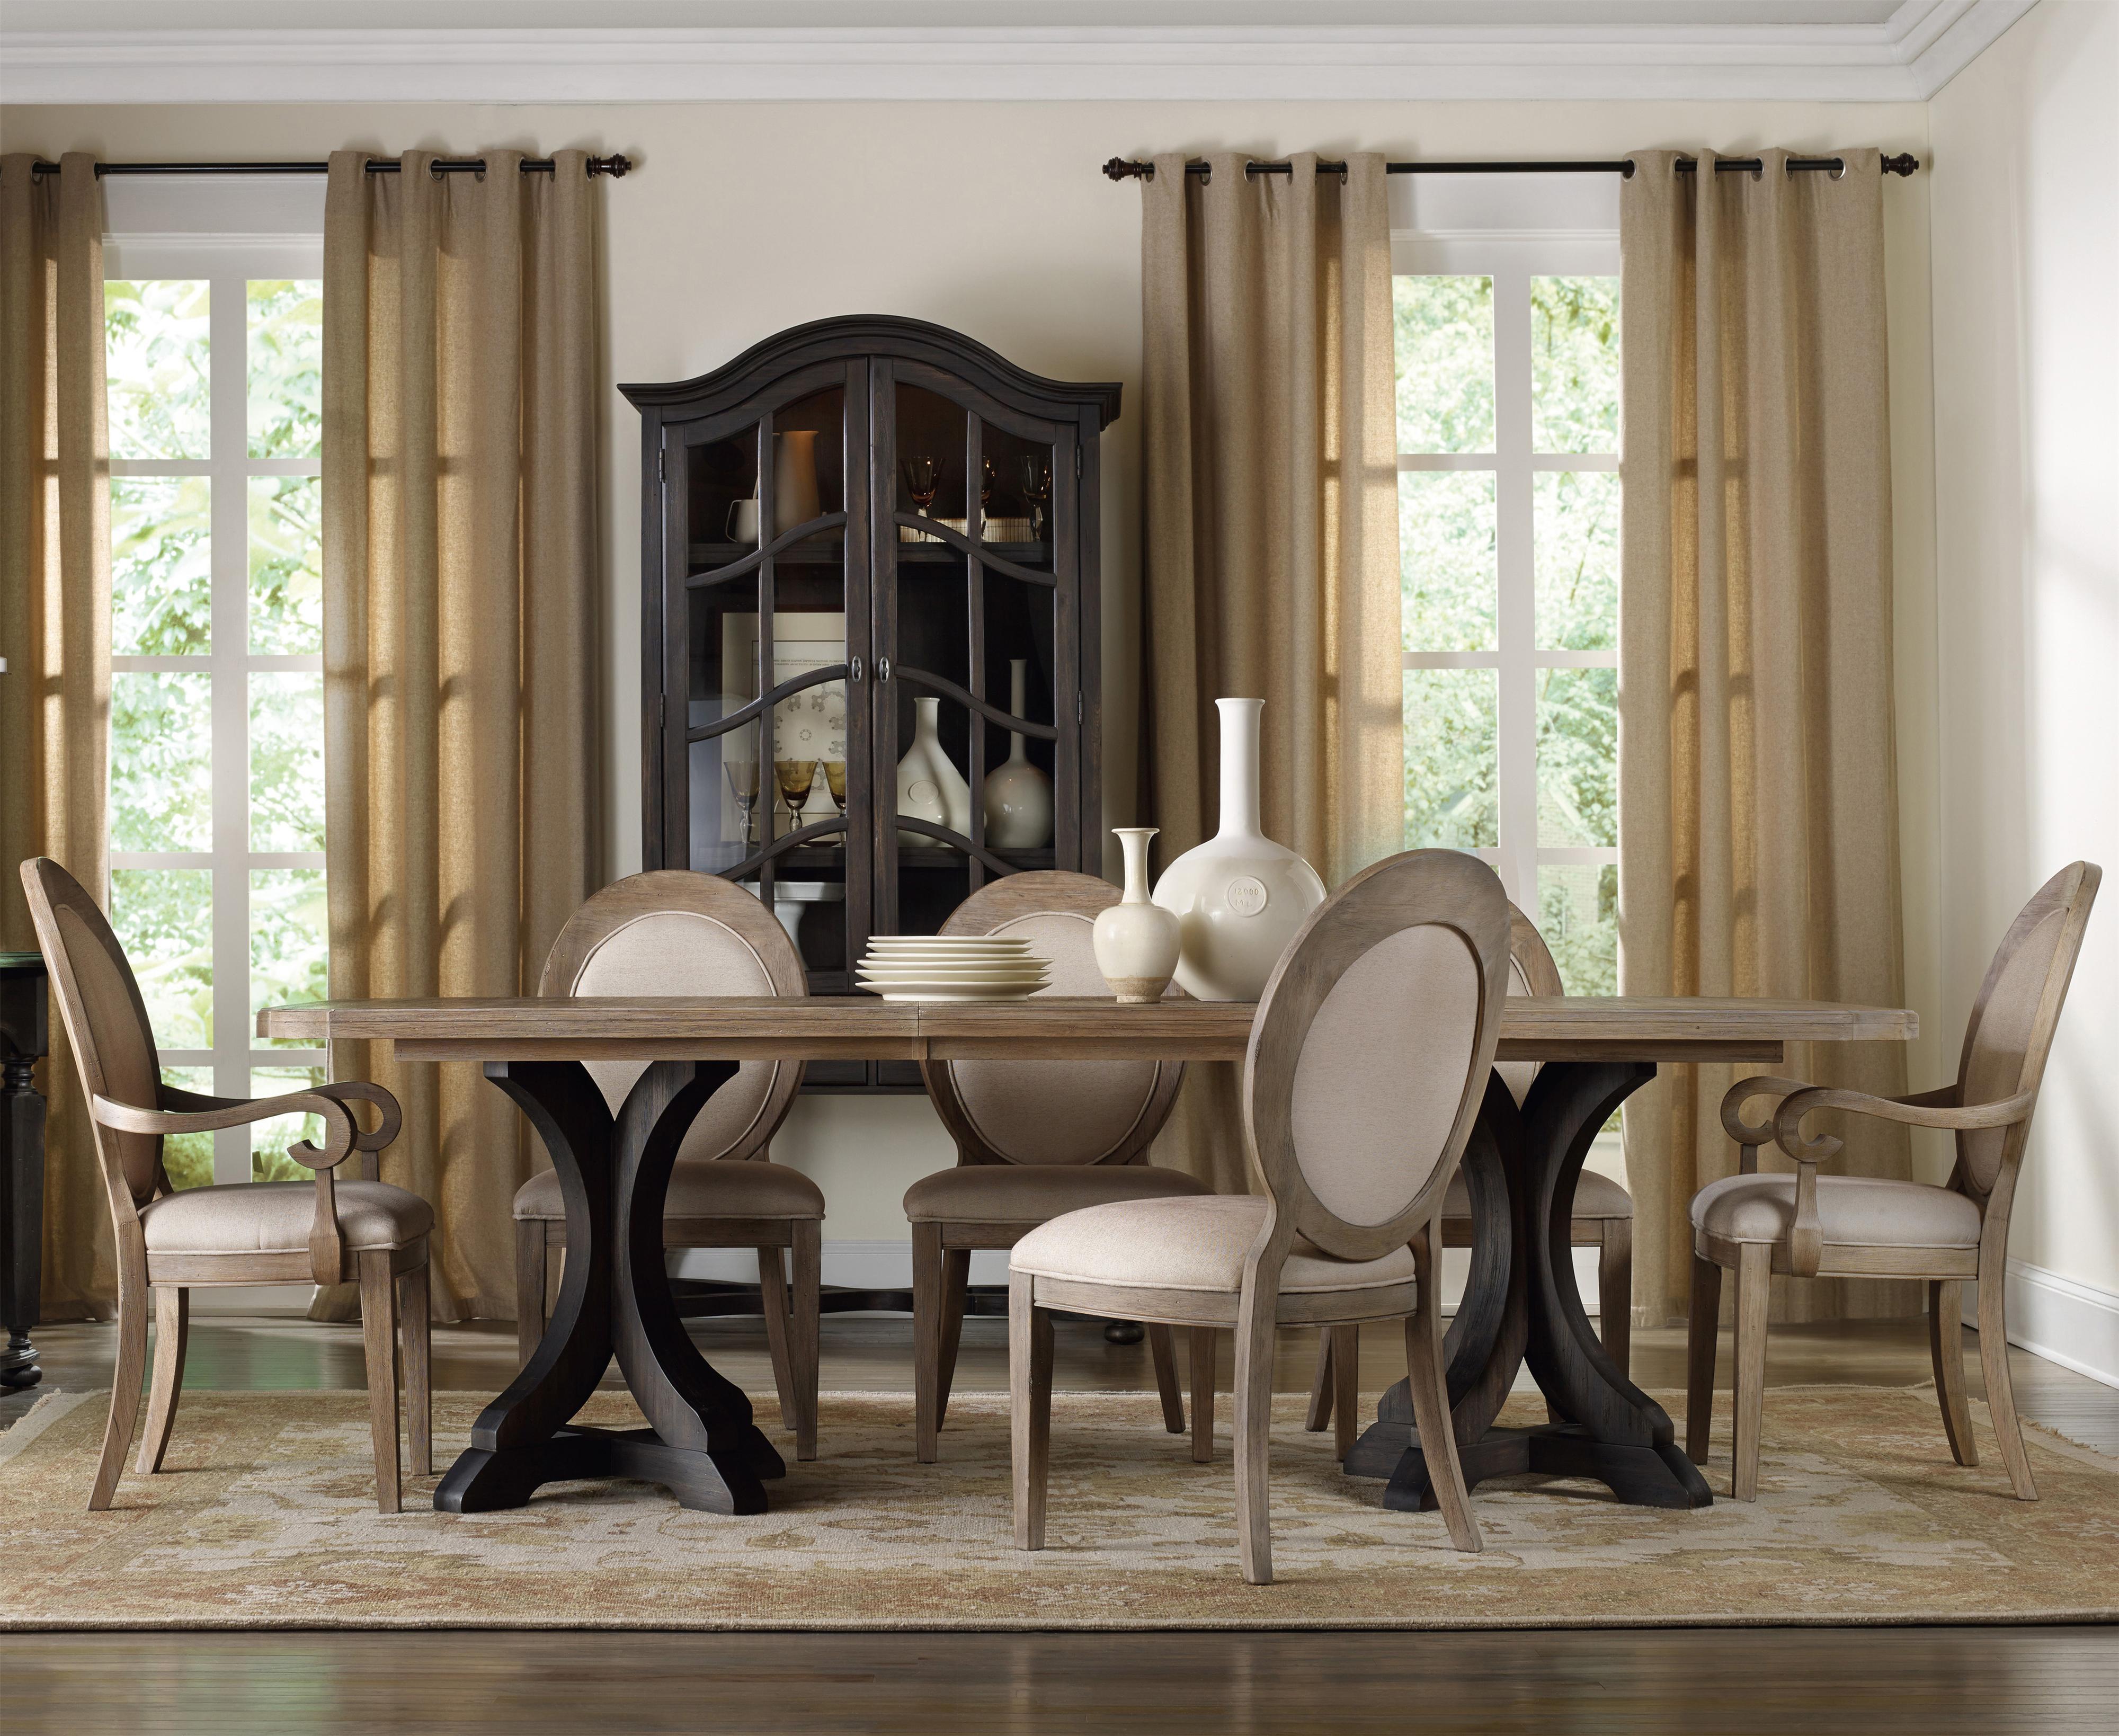 hooker furniture corsica rectangle pedestal dining table set with oval back chairs olinde 39 s. Black Bedroom Furniture Sets. Home Design Ideas